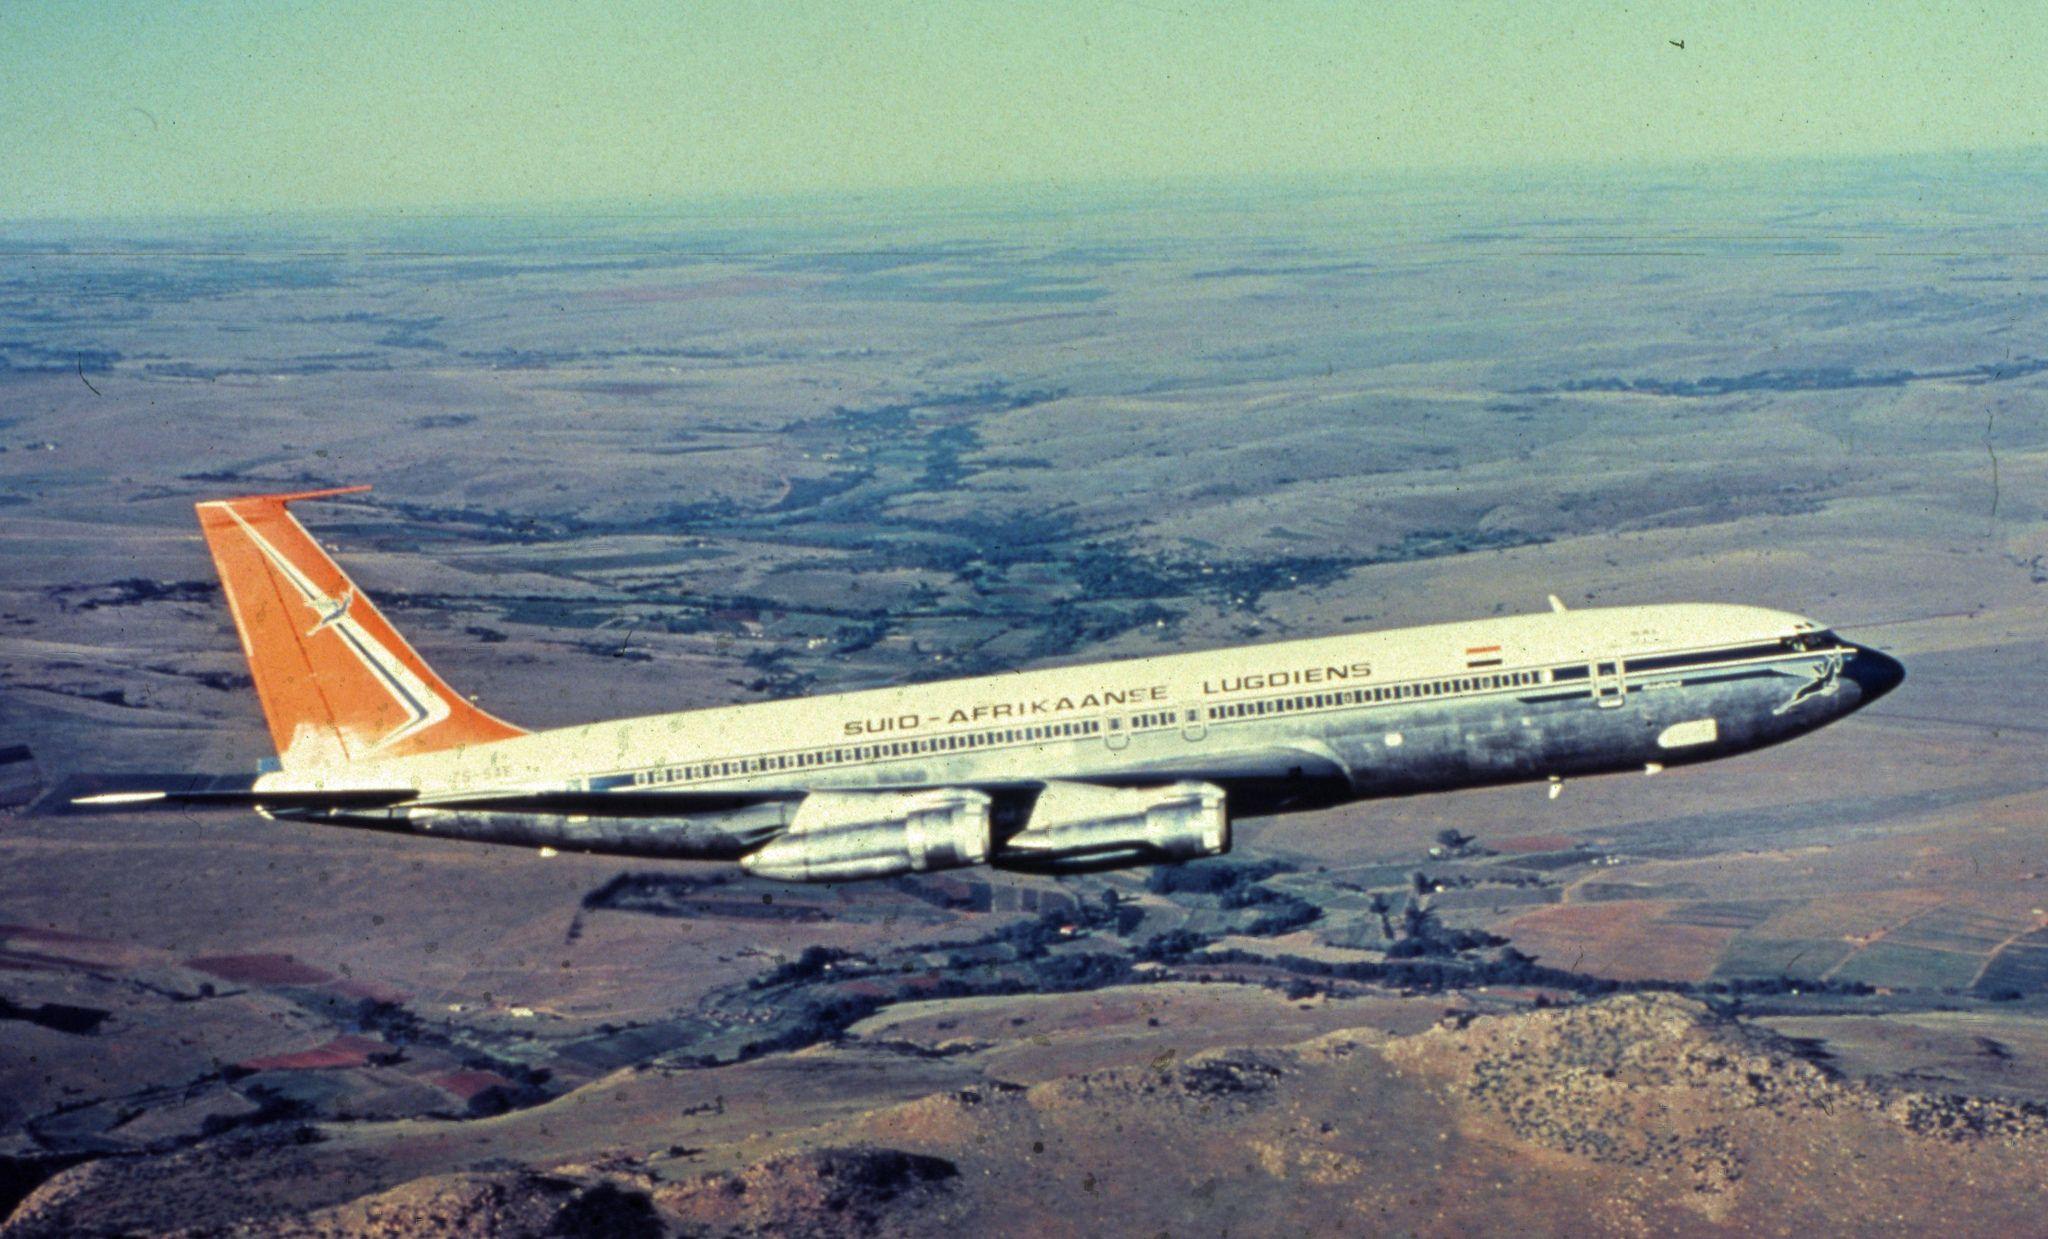 South African Airways South african airways, Vintage